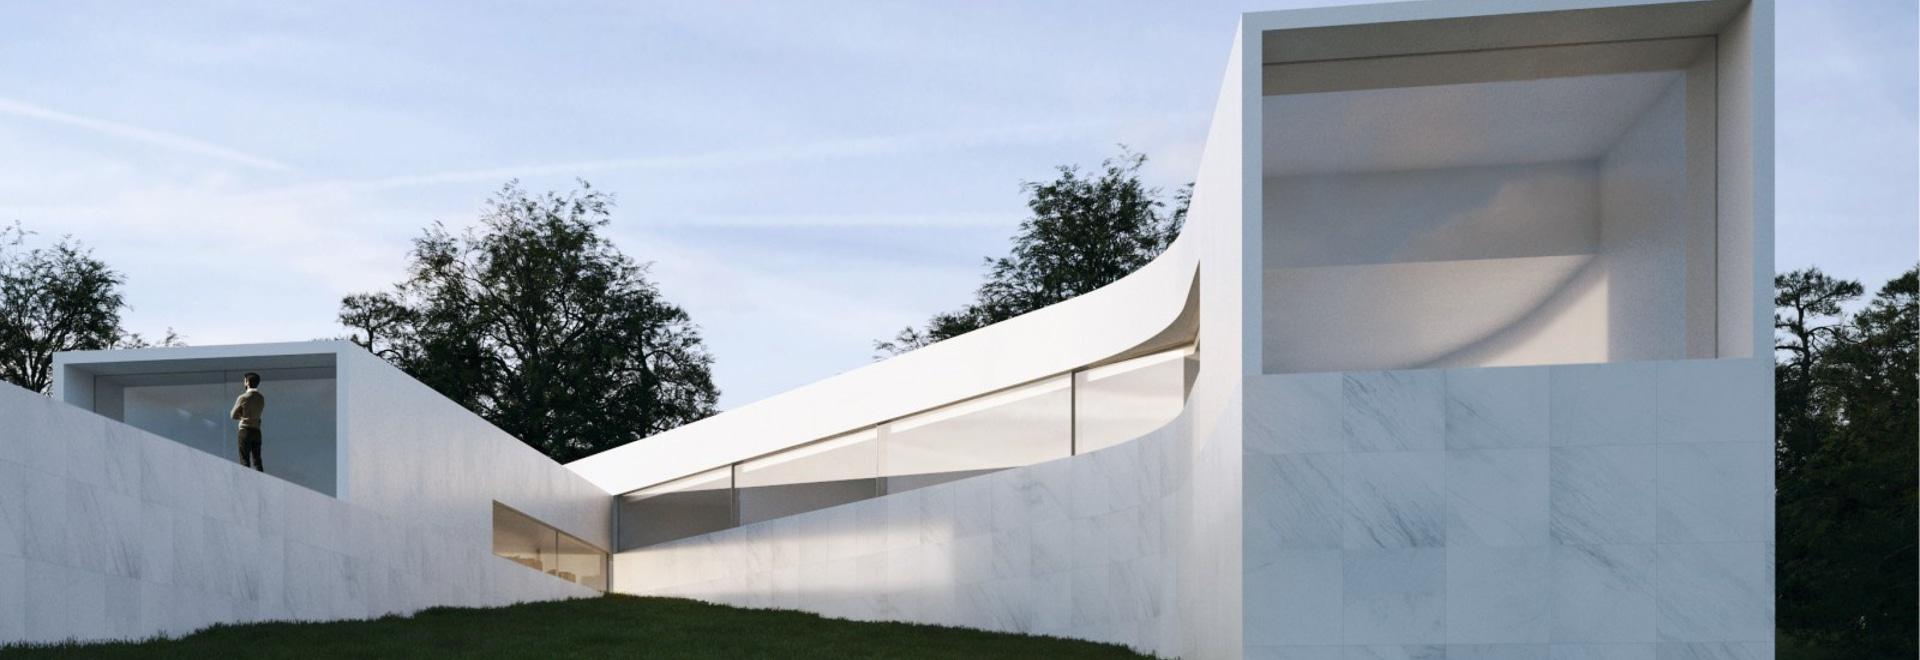 Haus Coimbra-Steinmann von Fran Silvestre Arquitectos